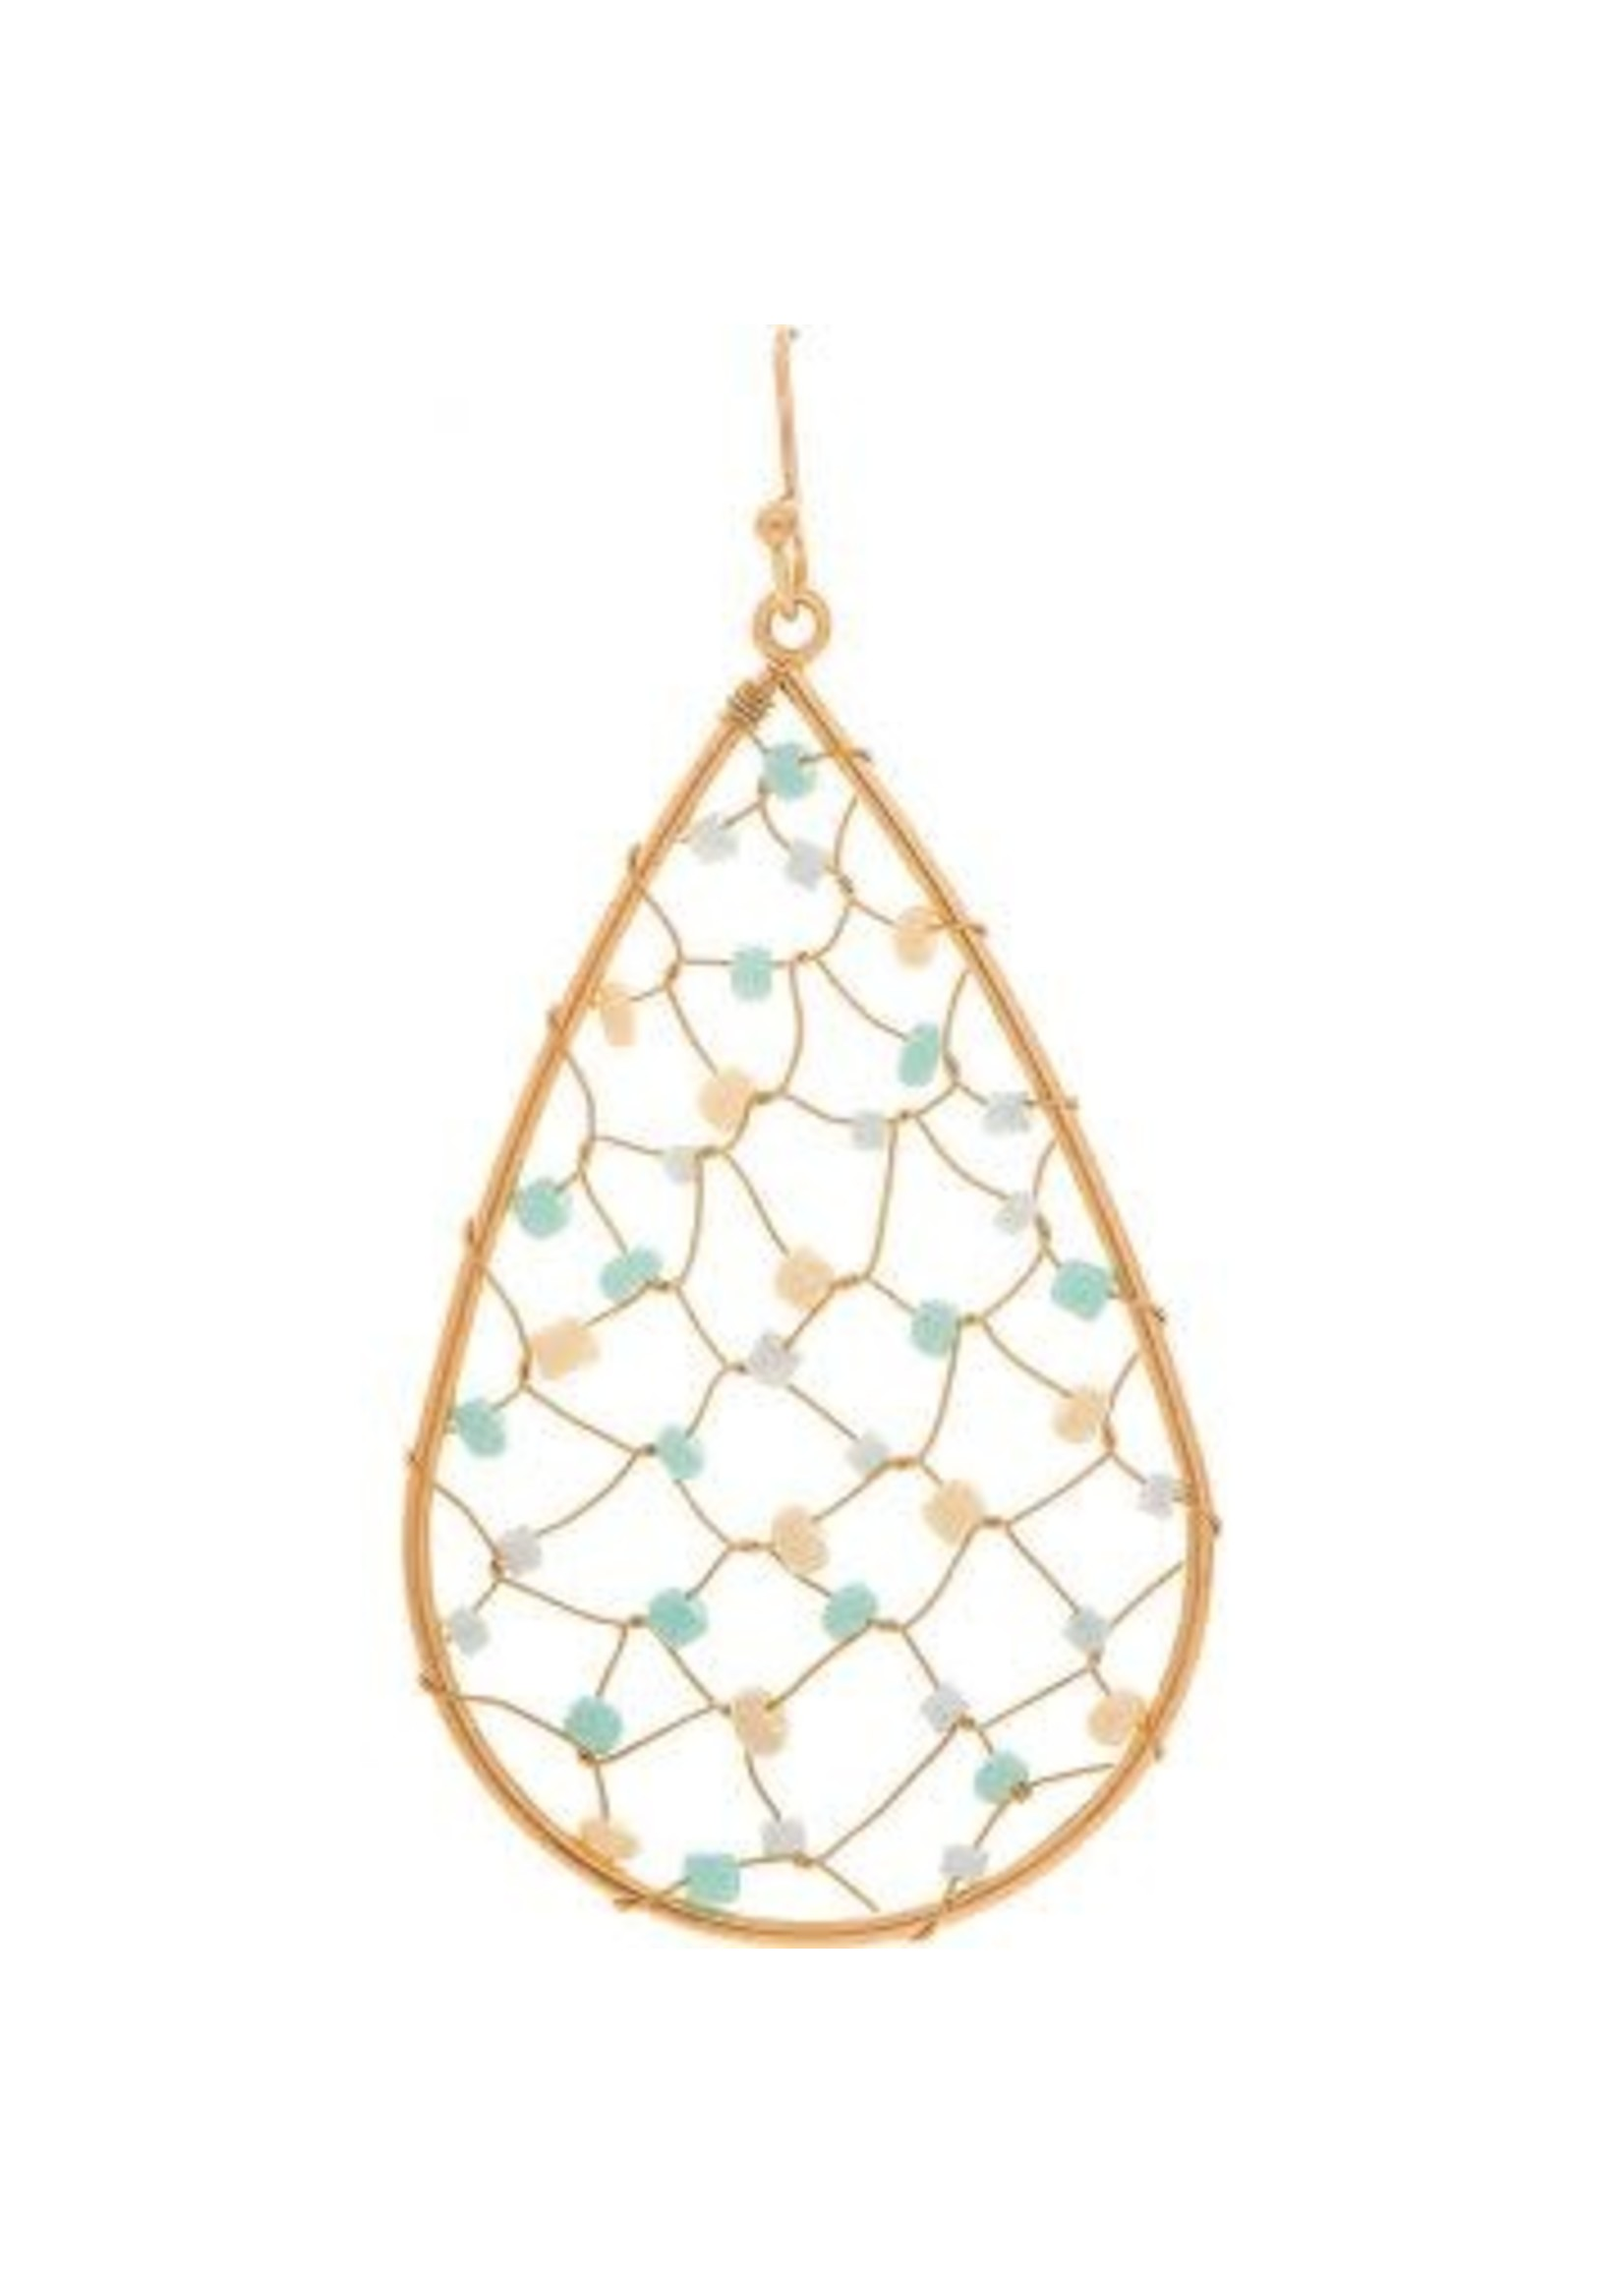 Rain Jewelry Teardrop Turquoise Threaded Bead Earring